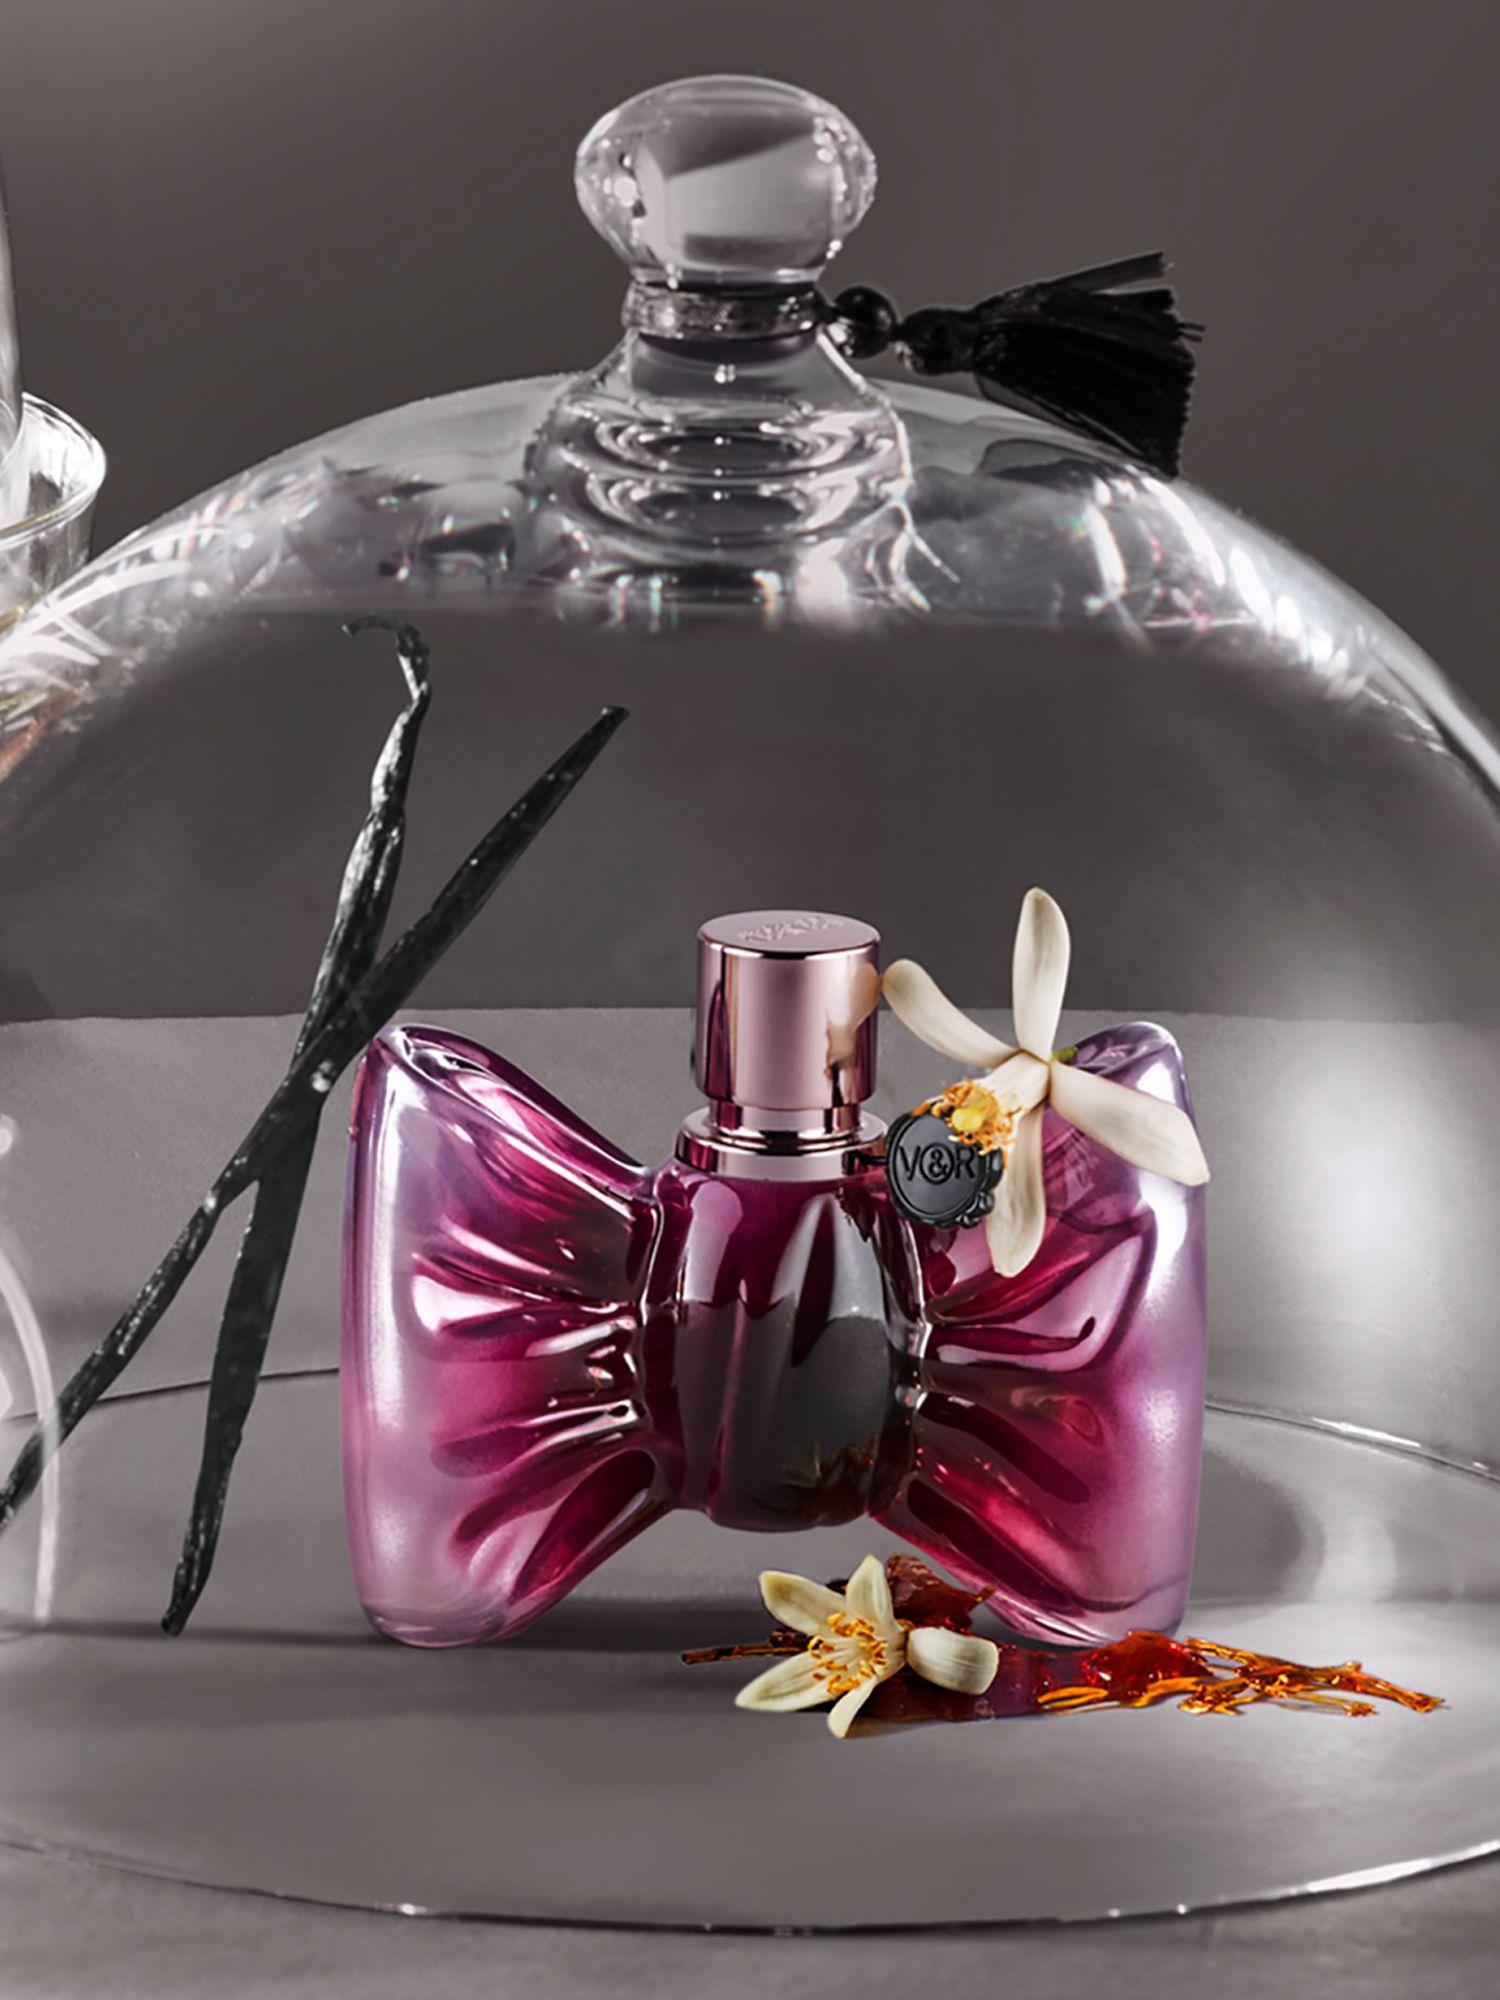 Viktor & Rolf Viktor & Rolf Bonbon Couture Eau de Parfum Intense